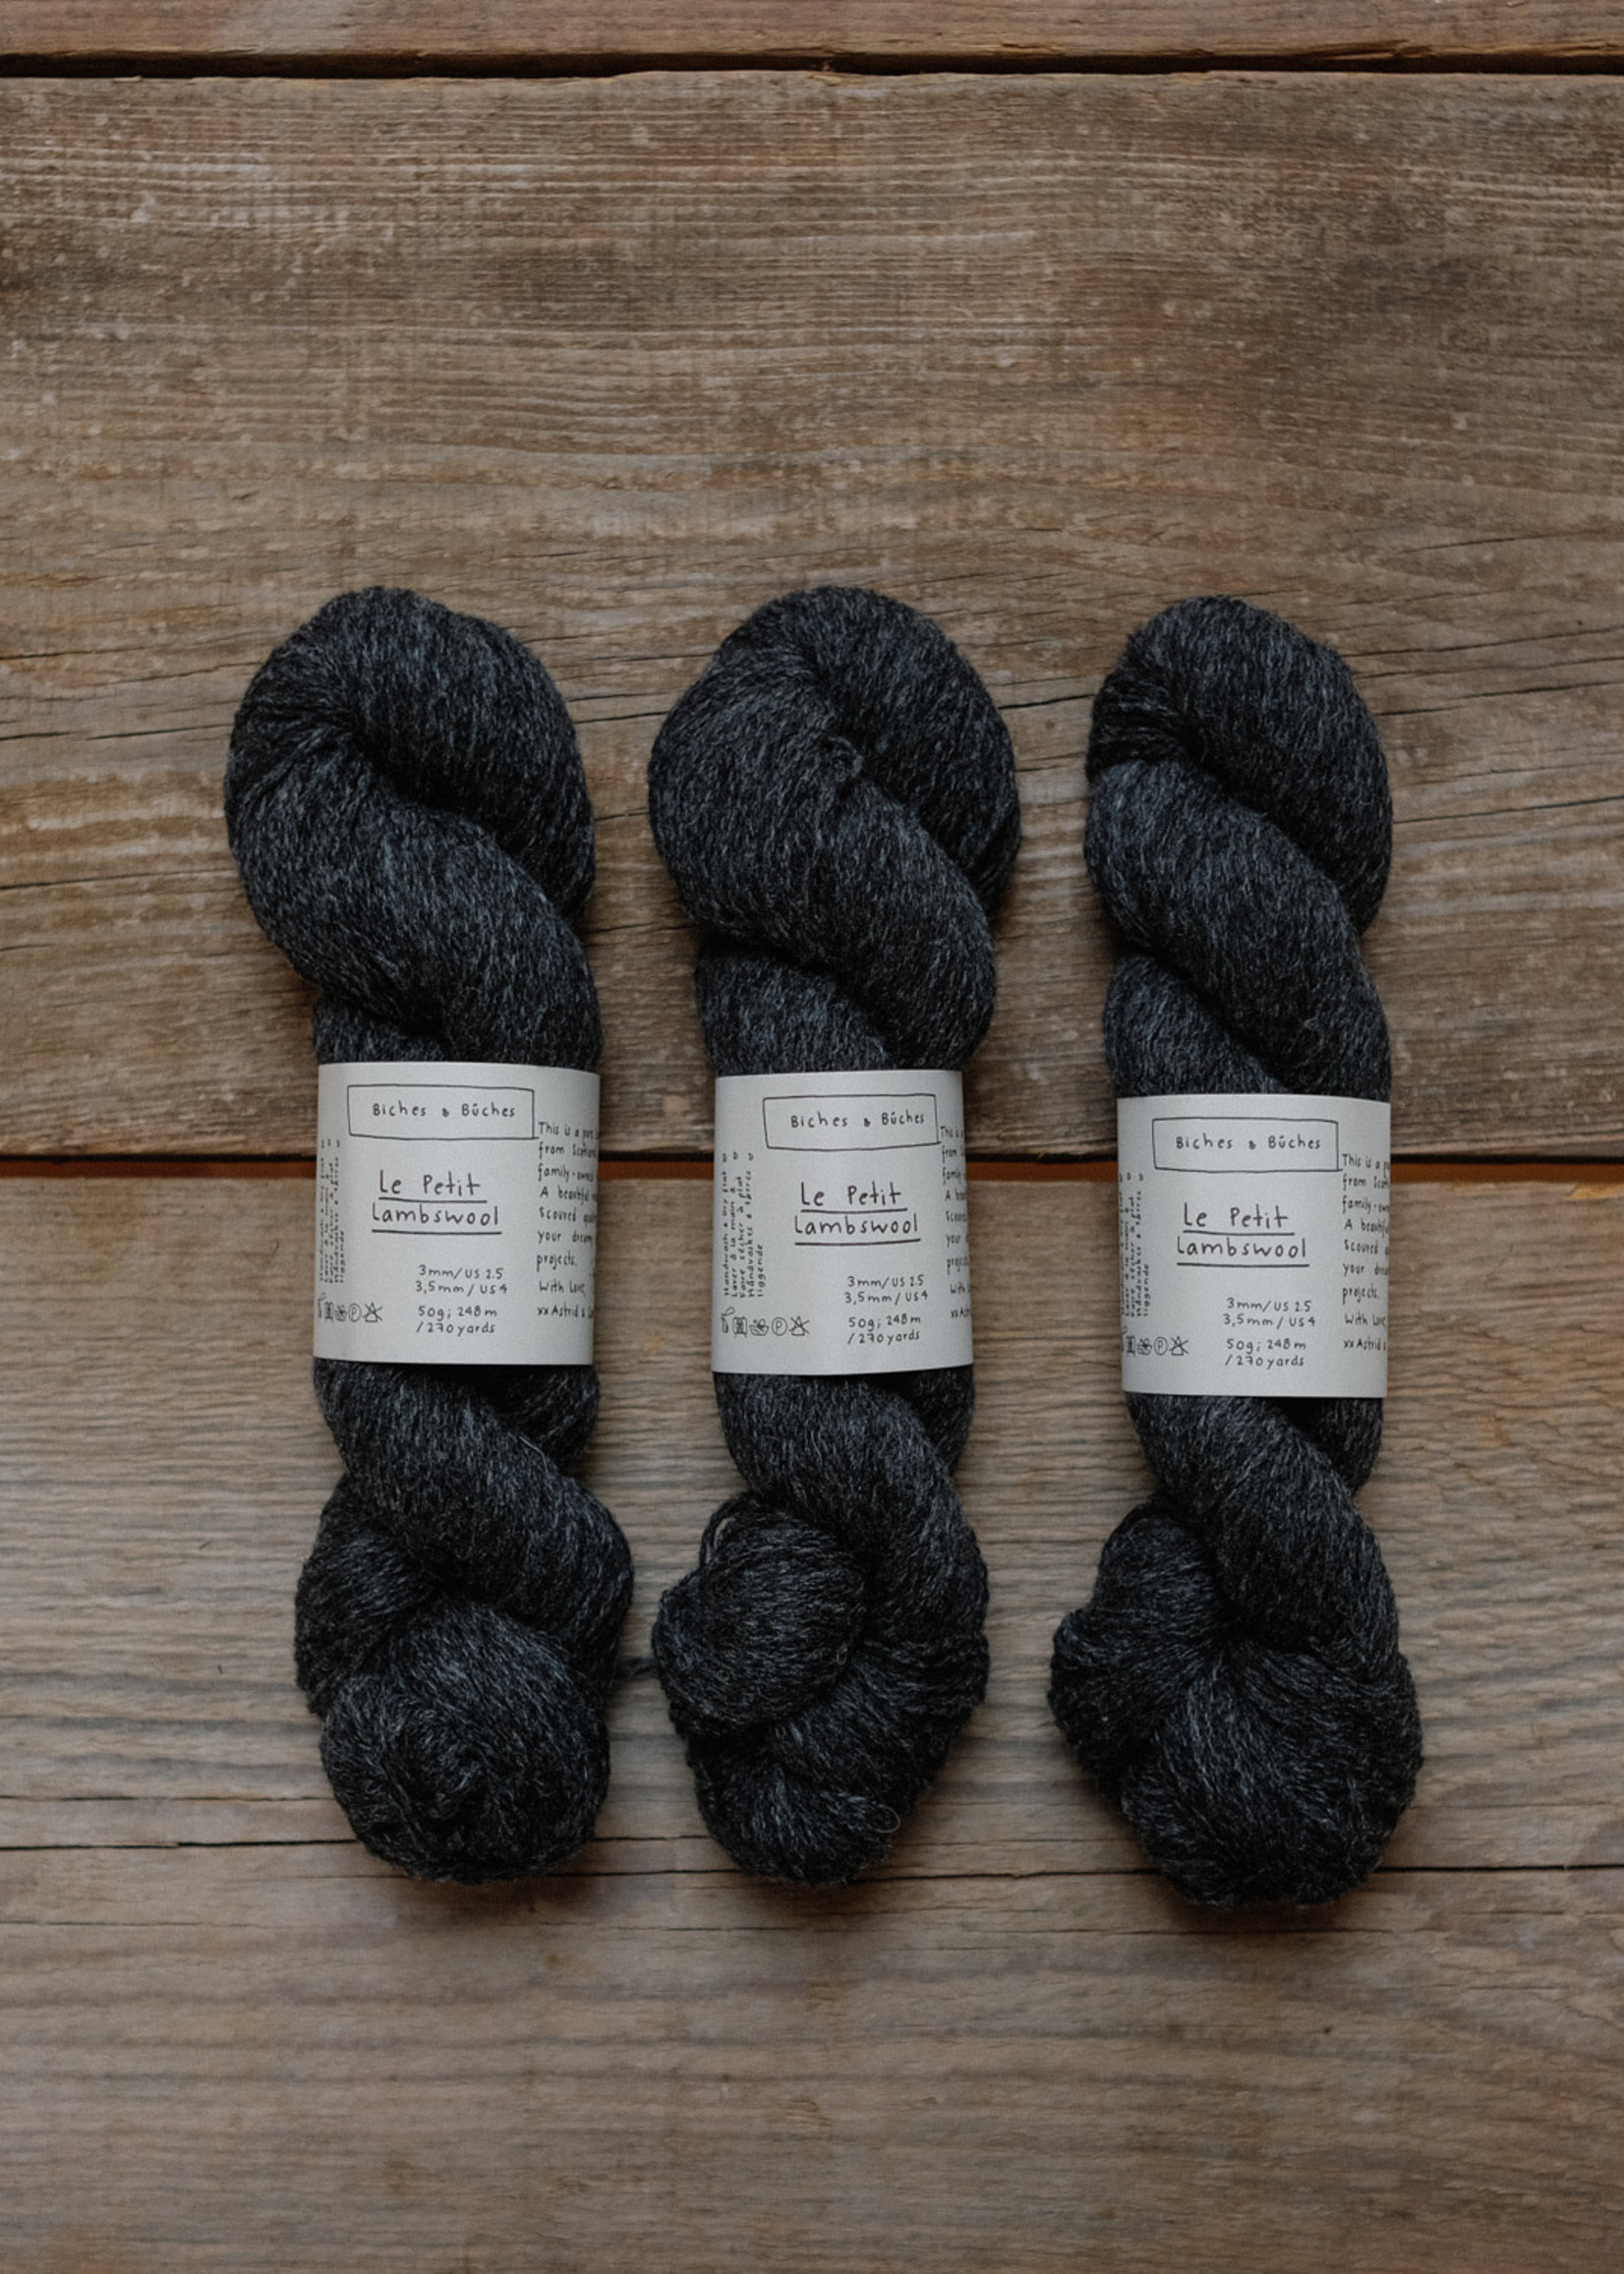 Biches & Bûches Biches & Buches Le Petit Lambswool Dark Grey